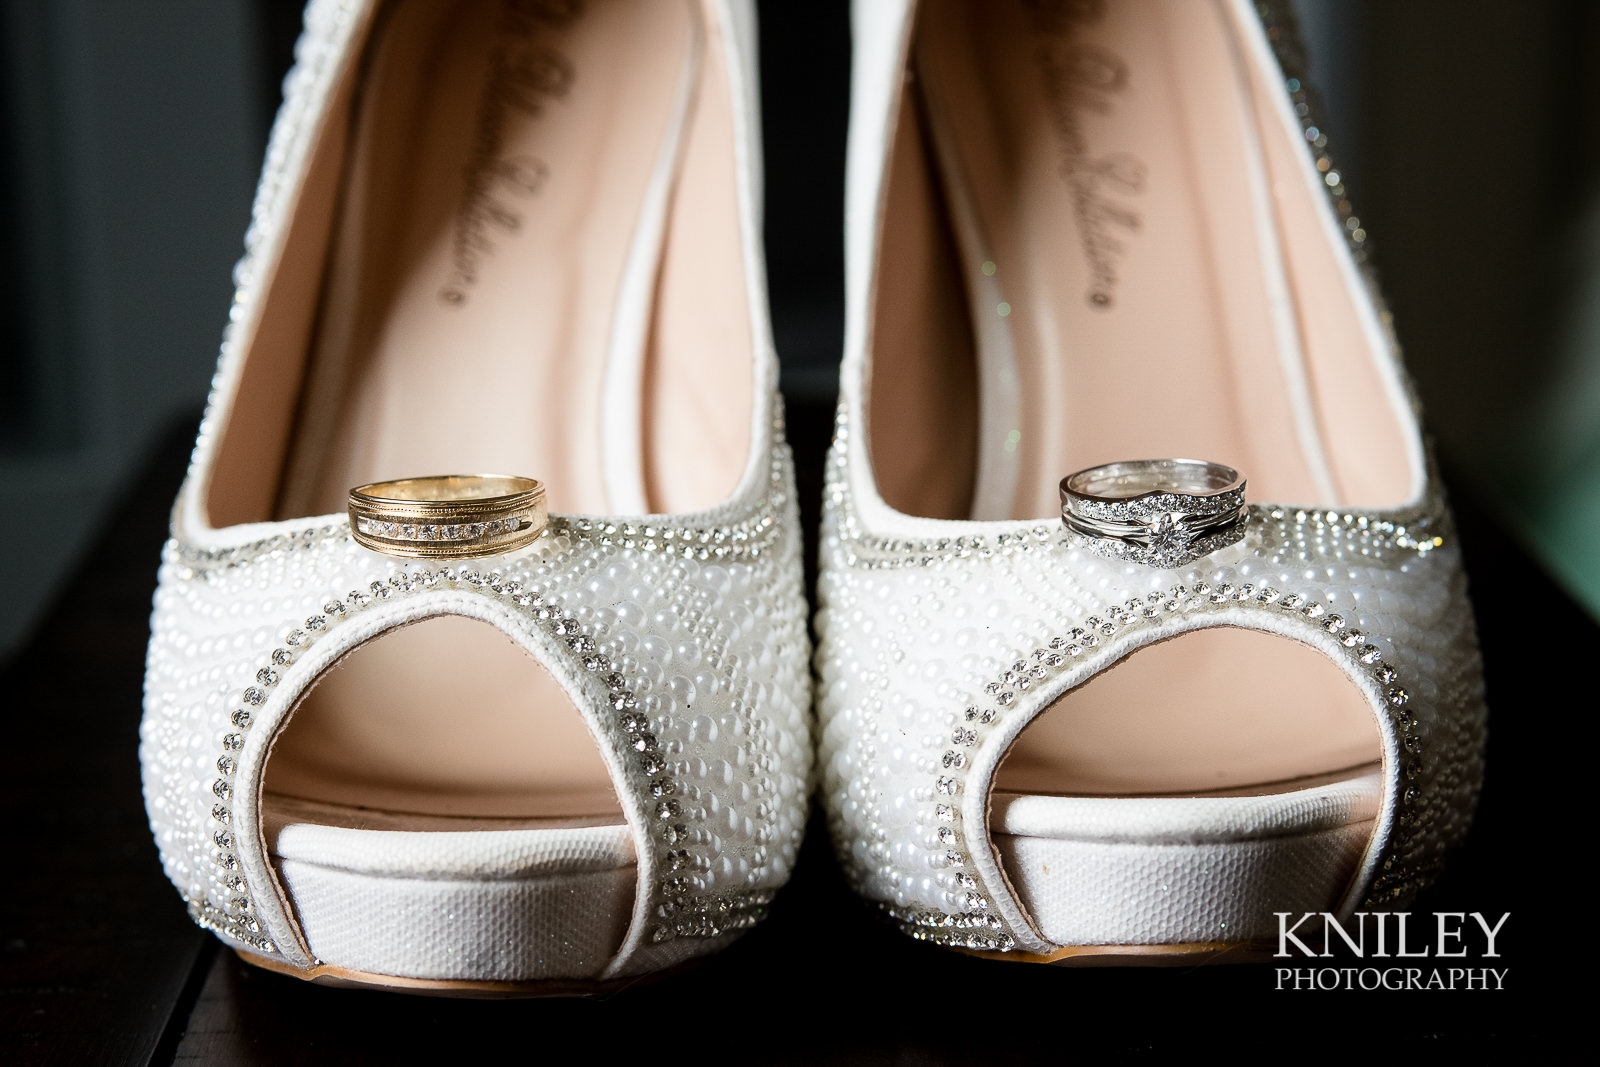 013 - Webster NY Wedding Prep Picture - XT2B3634.jpg